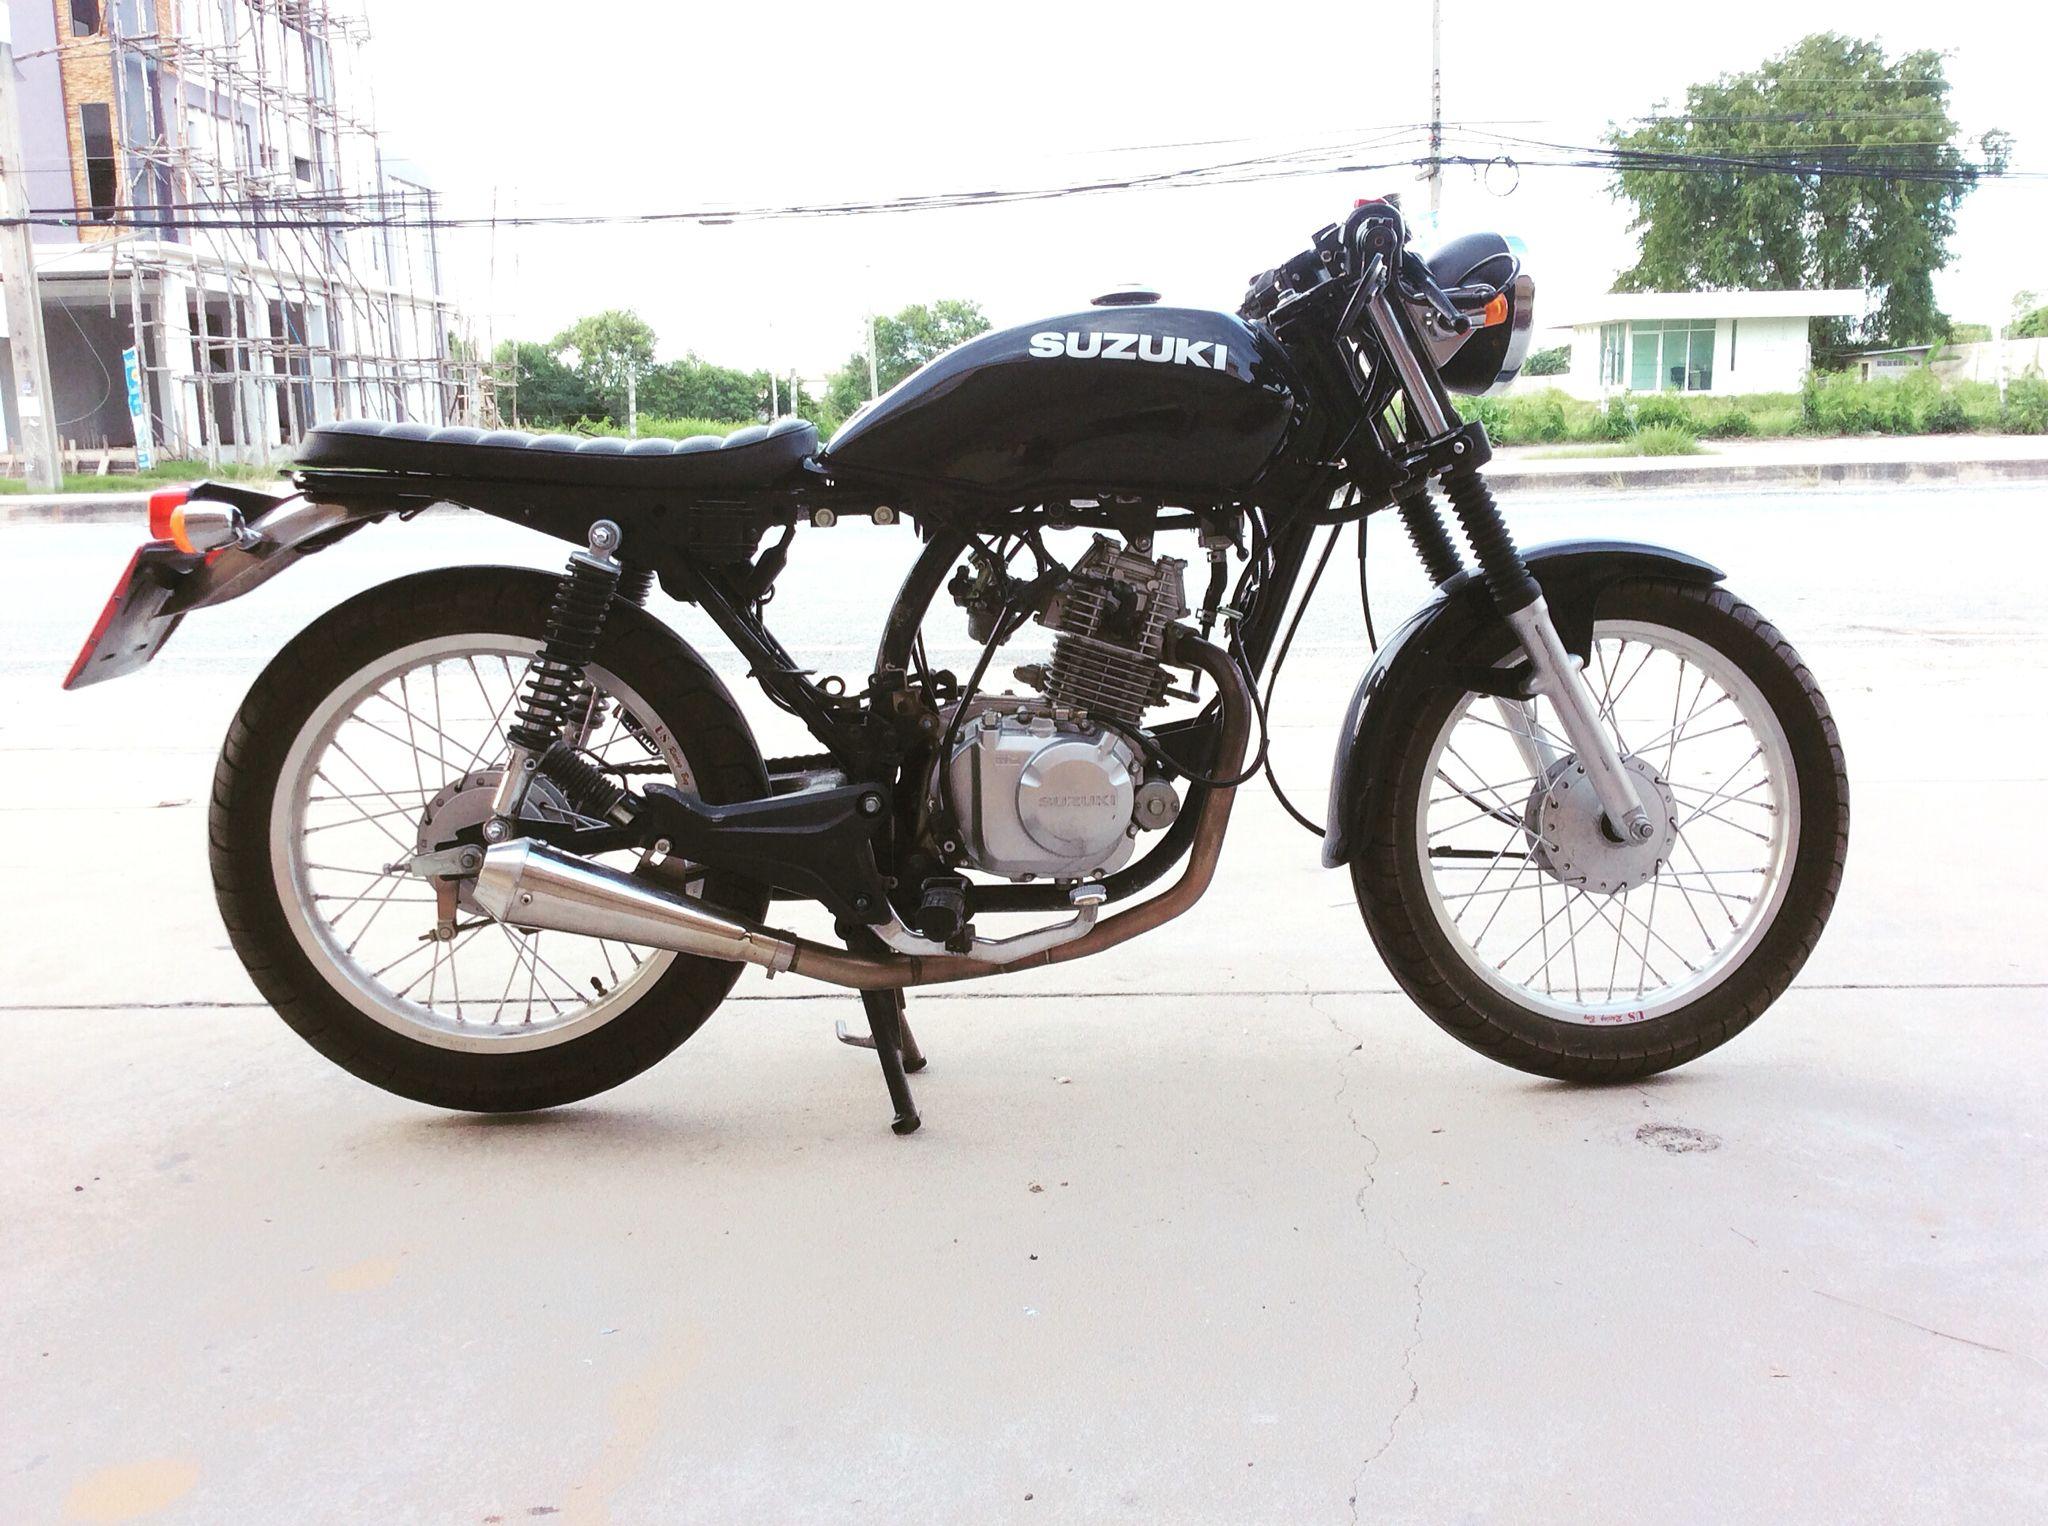 A Small Suzuki GD110HU AX4 Brat Cafe Racer | Motorcycles | Suzuki